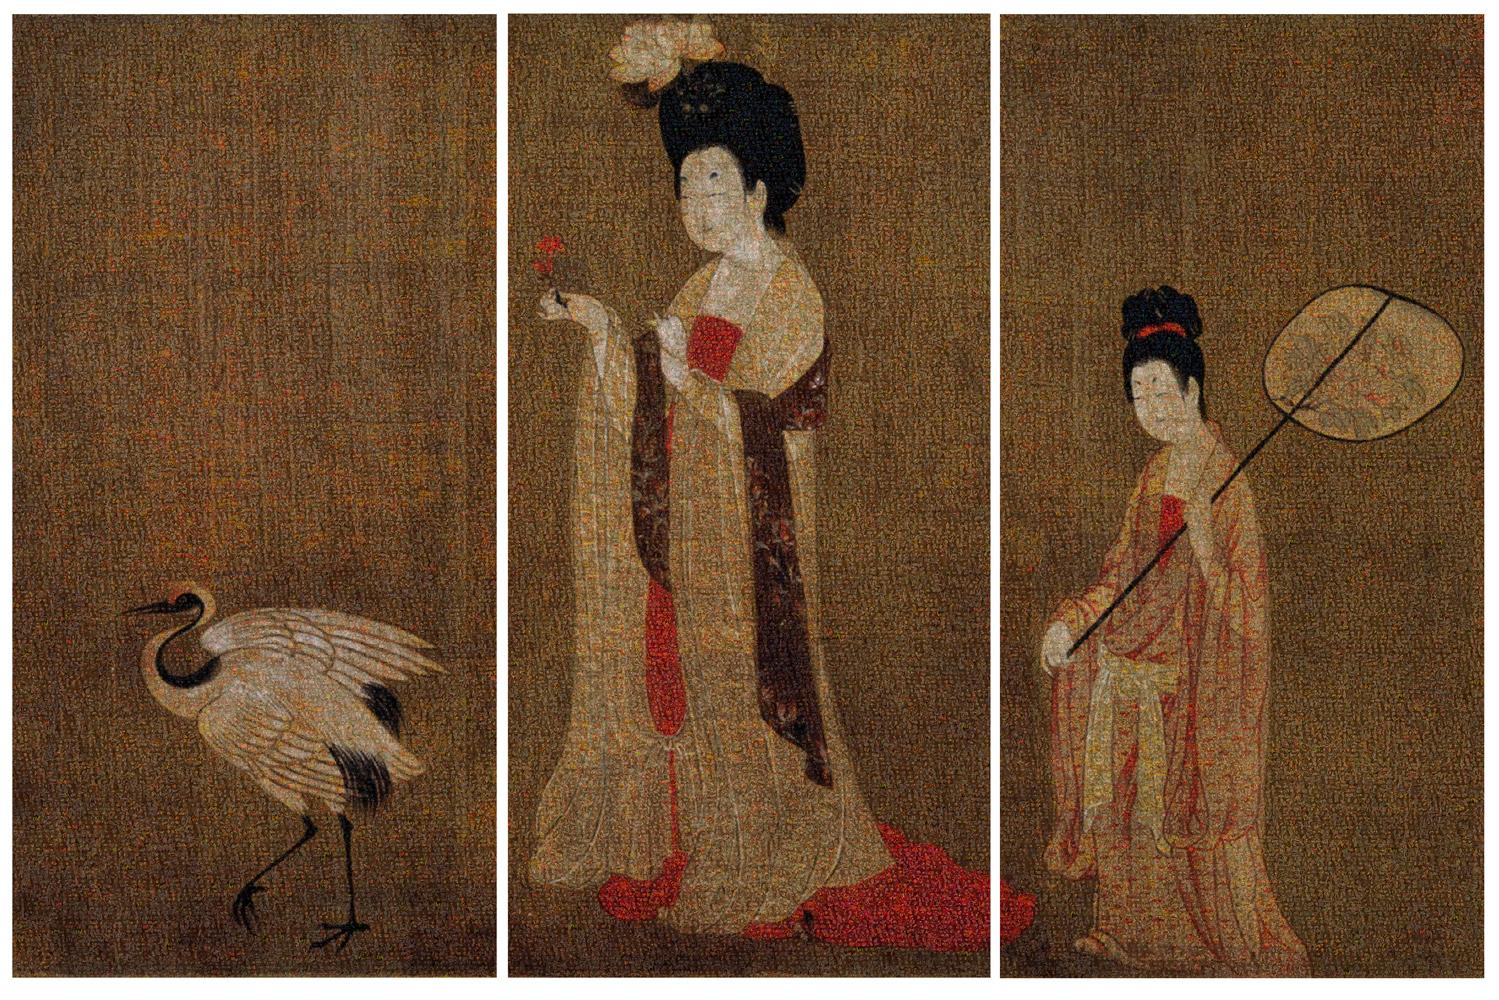 Guo Jian,  The Beauty No. 1,  inkjet pigment print (three panels), 200 x 300 cm.